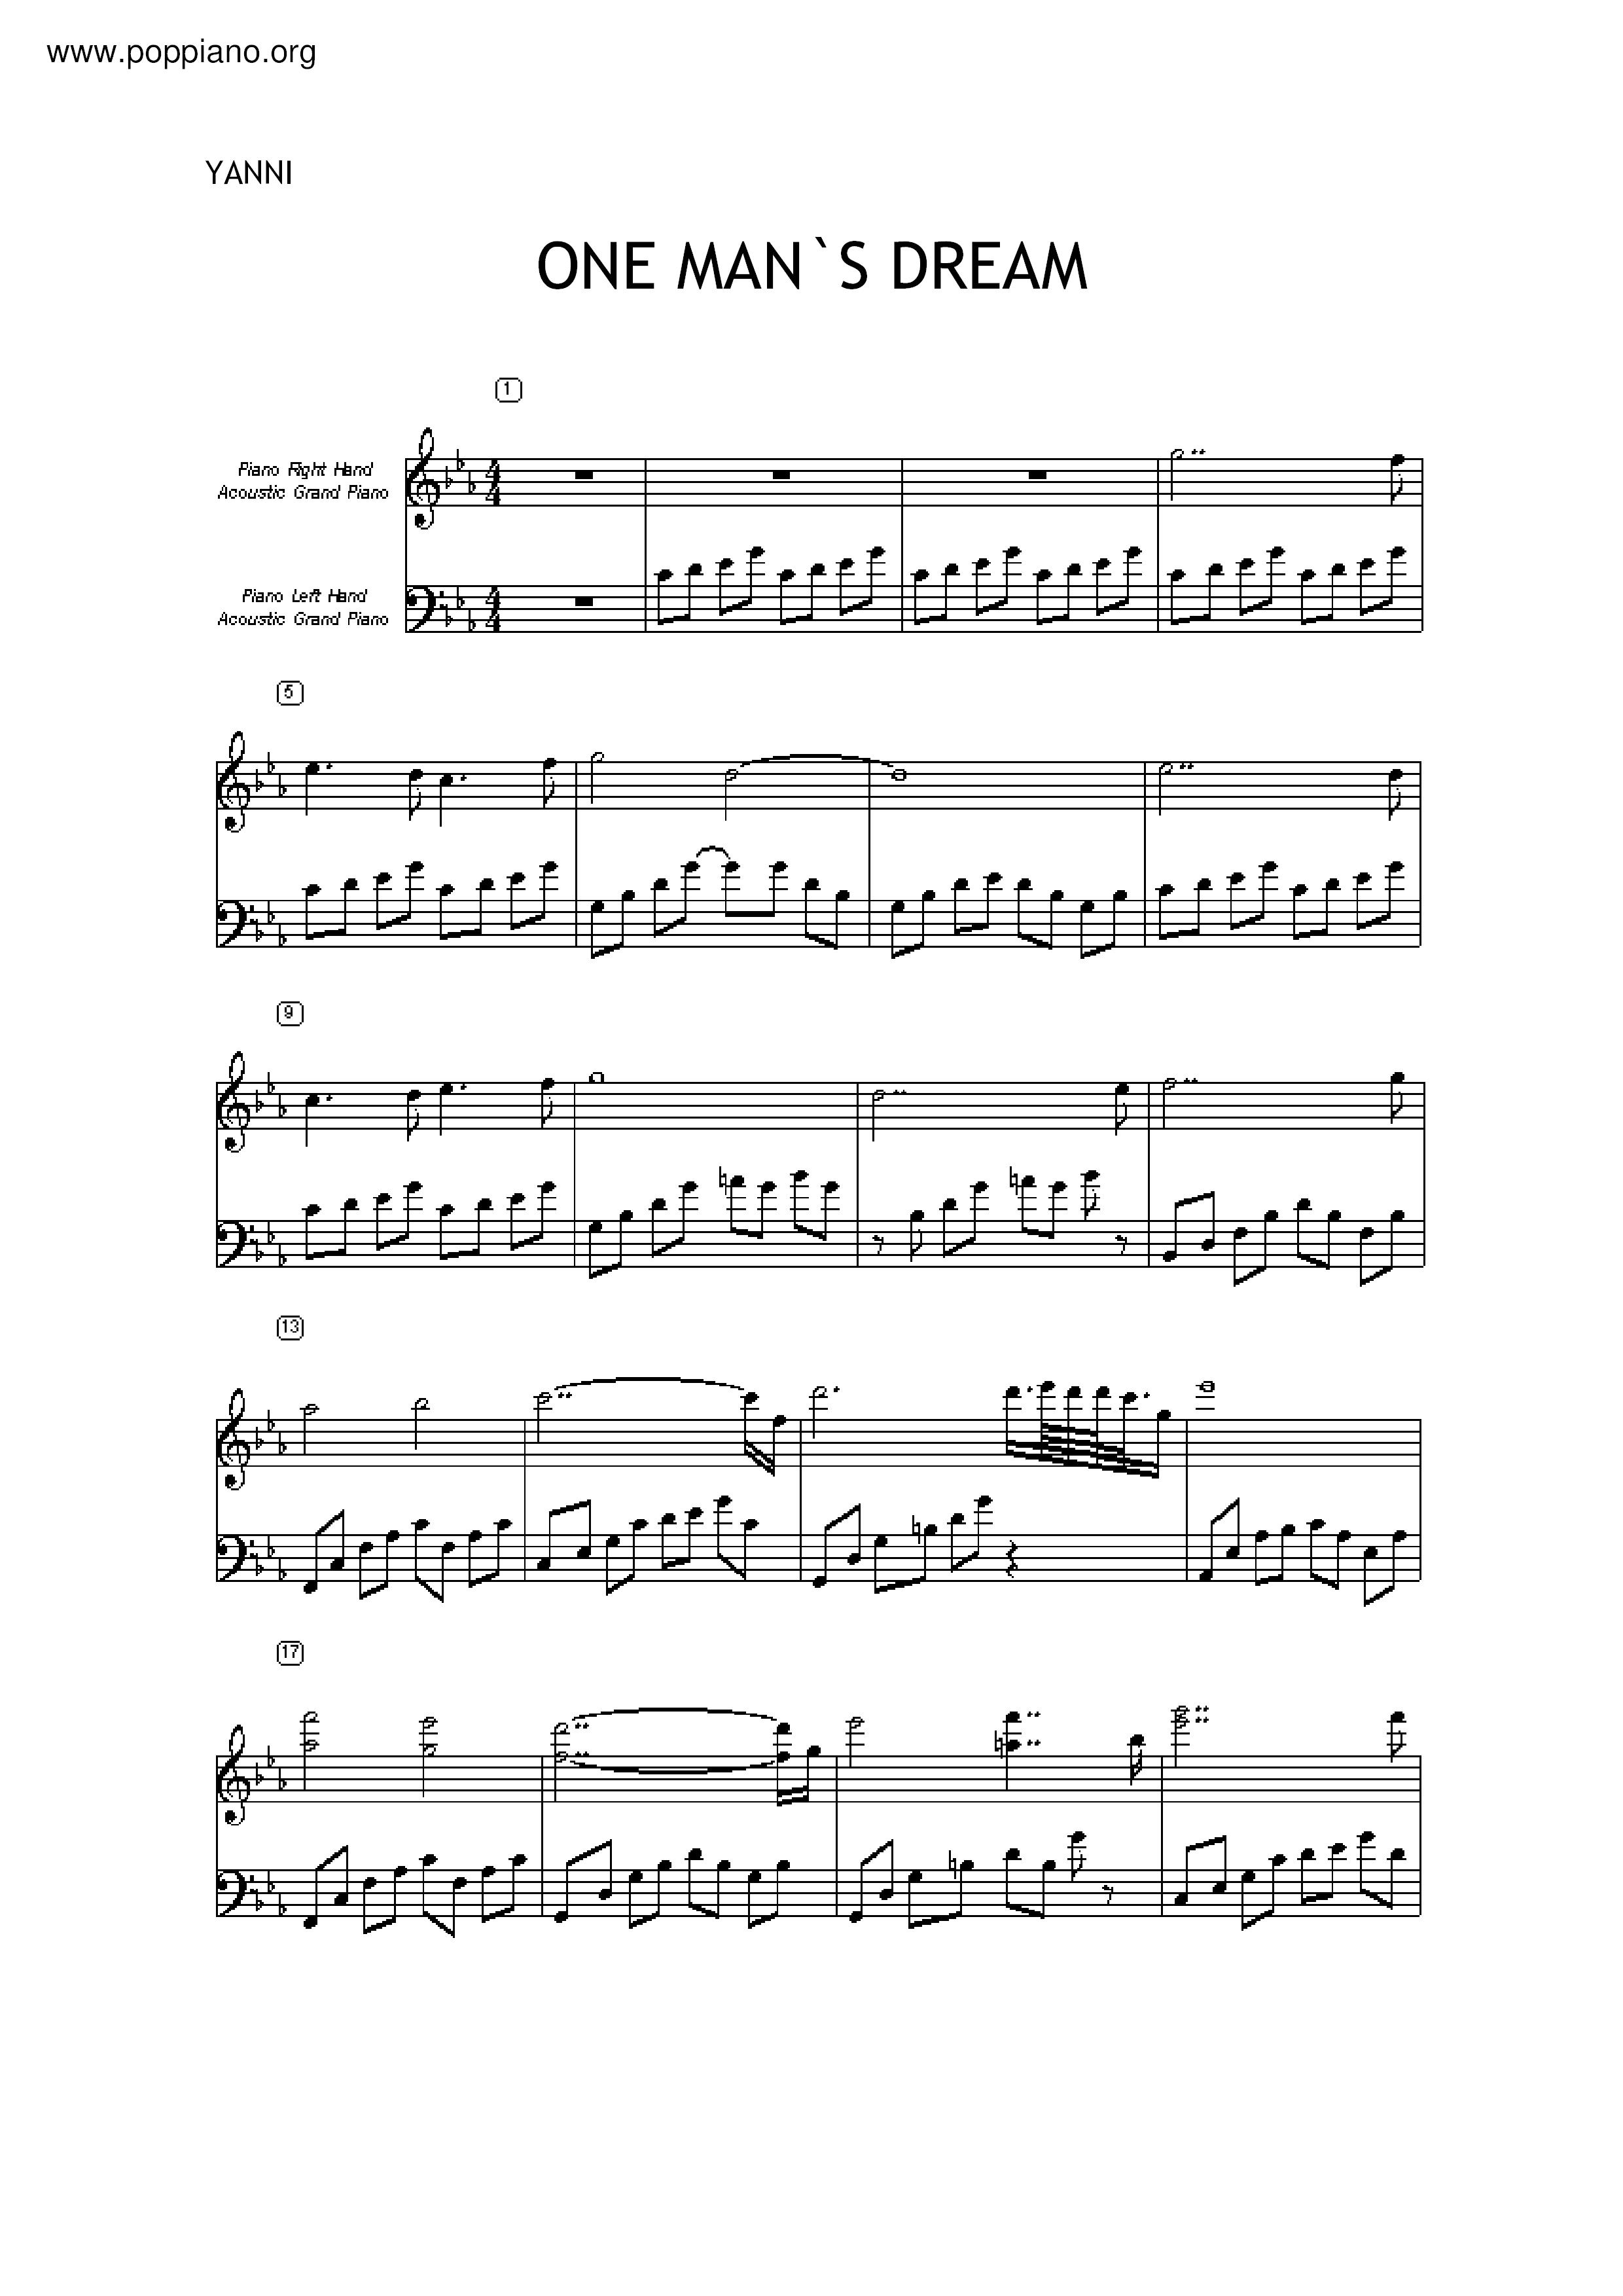 ☆ yanni-one man's dream sheet music pdf, - free score download ☆  www.poppiano.org